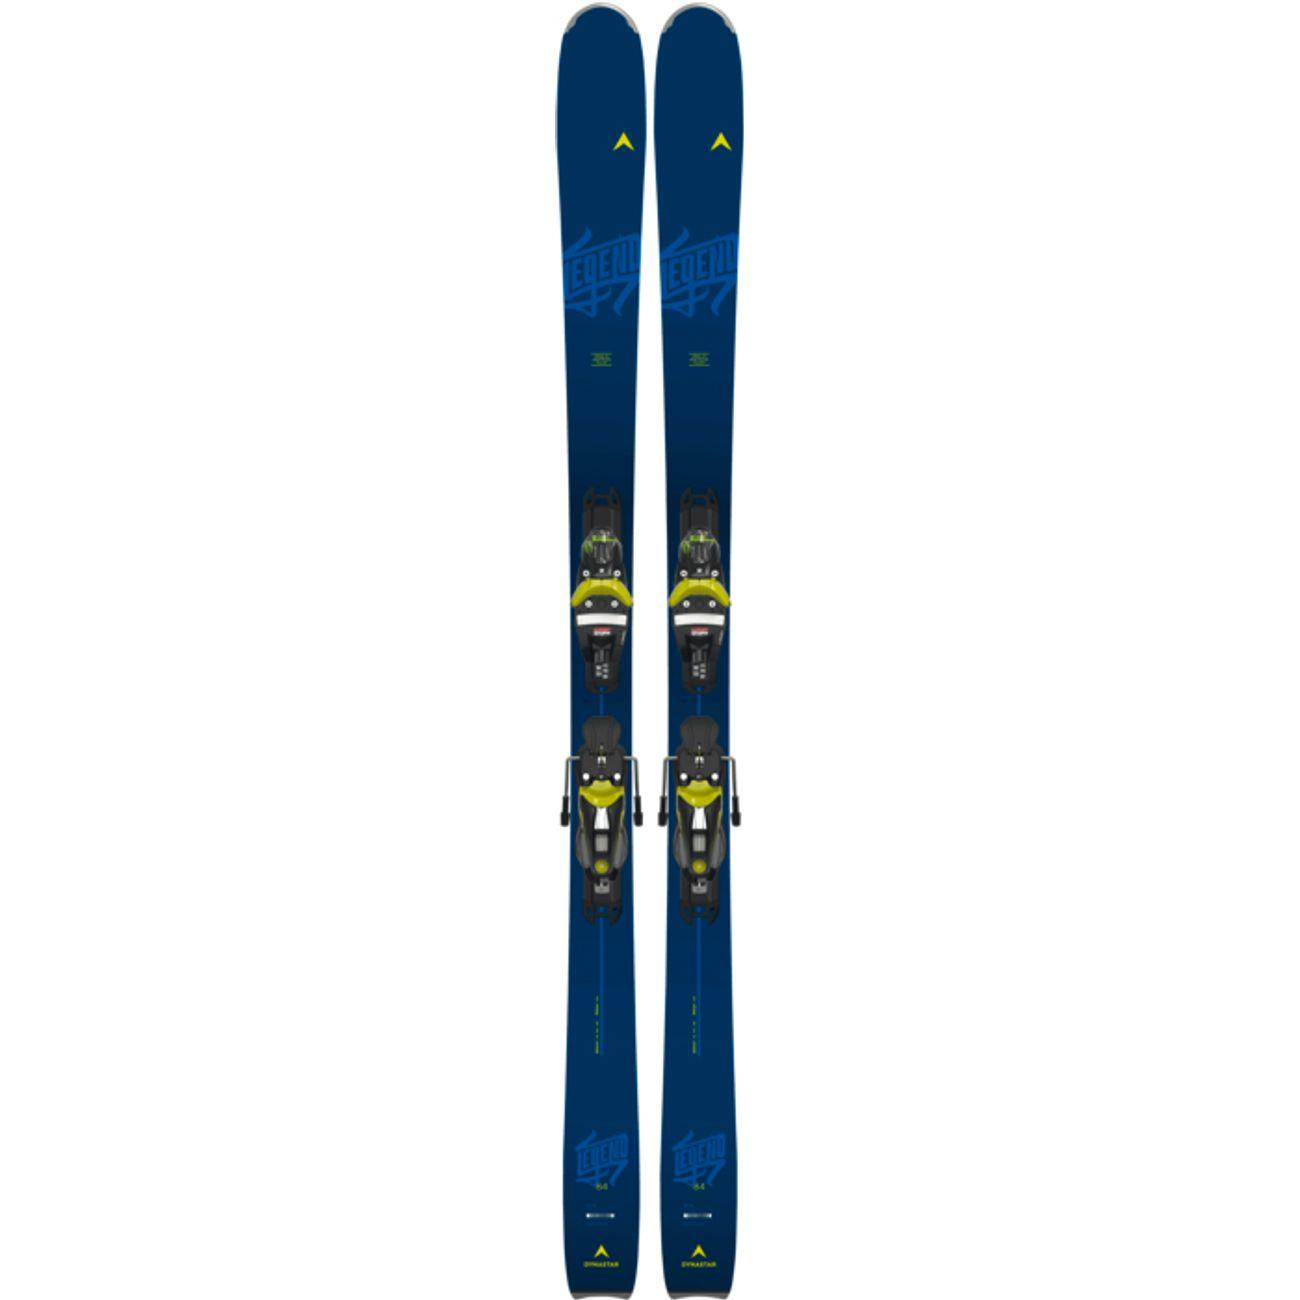 SKIS Ski adulte DYNASTAR LEGEND 84 (KONECT)  NX 12 KONECT GW